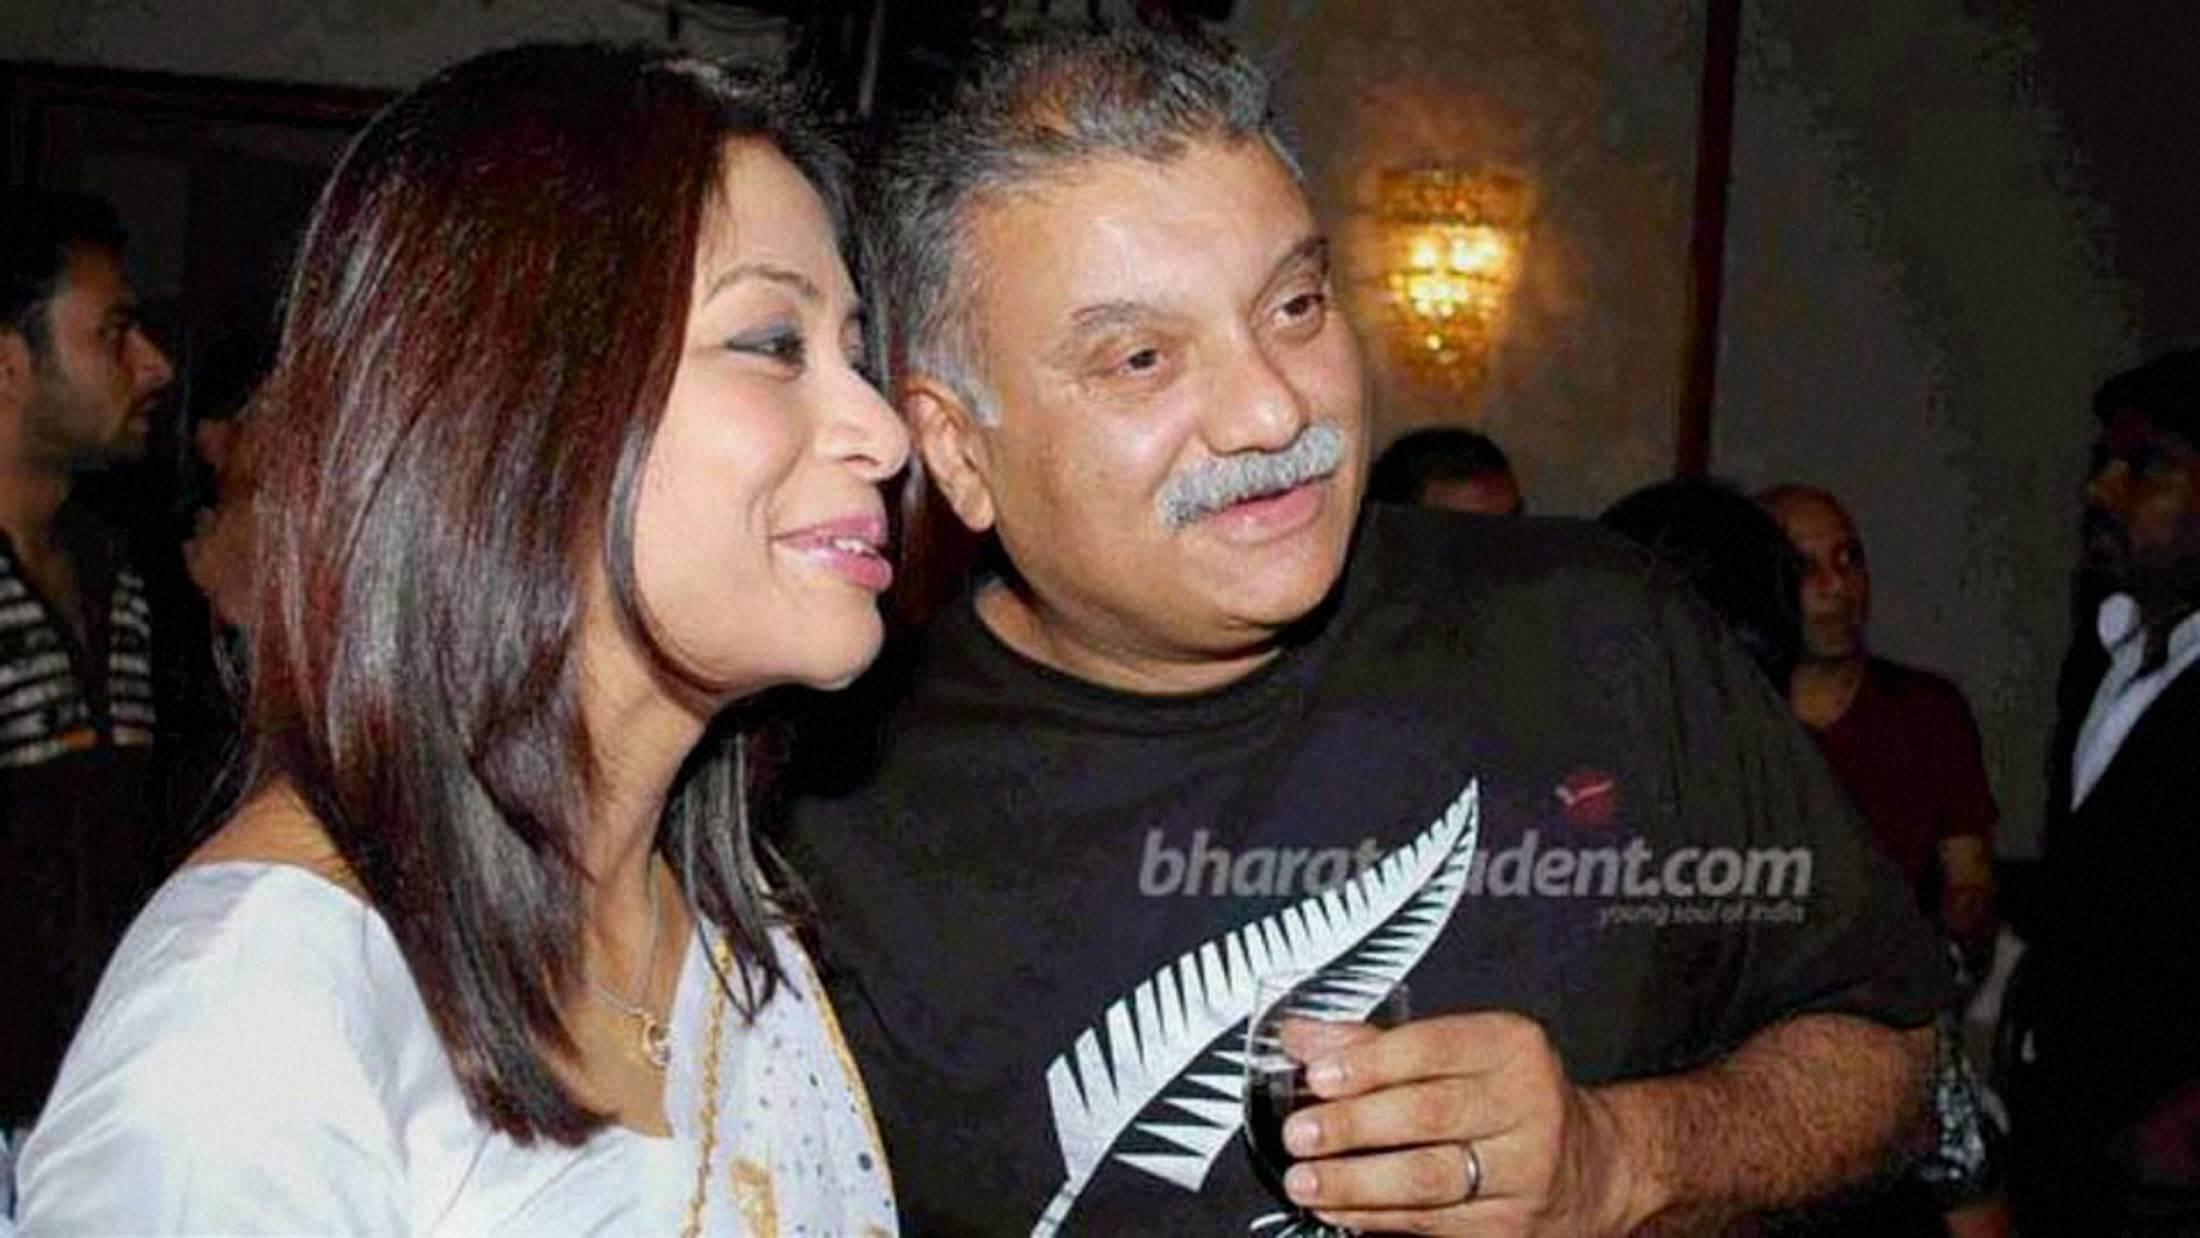 Sheena murder: Indrani schemer and manipulator, says secret witness